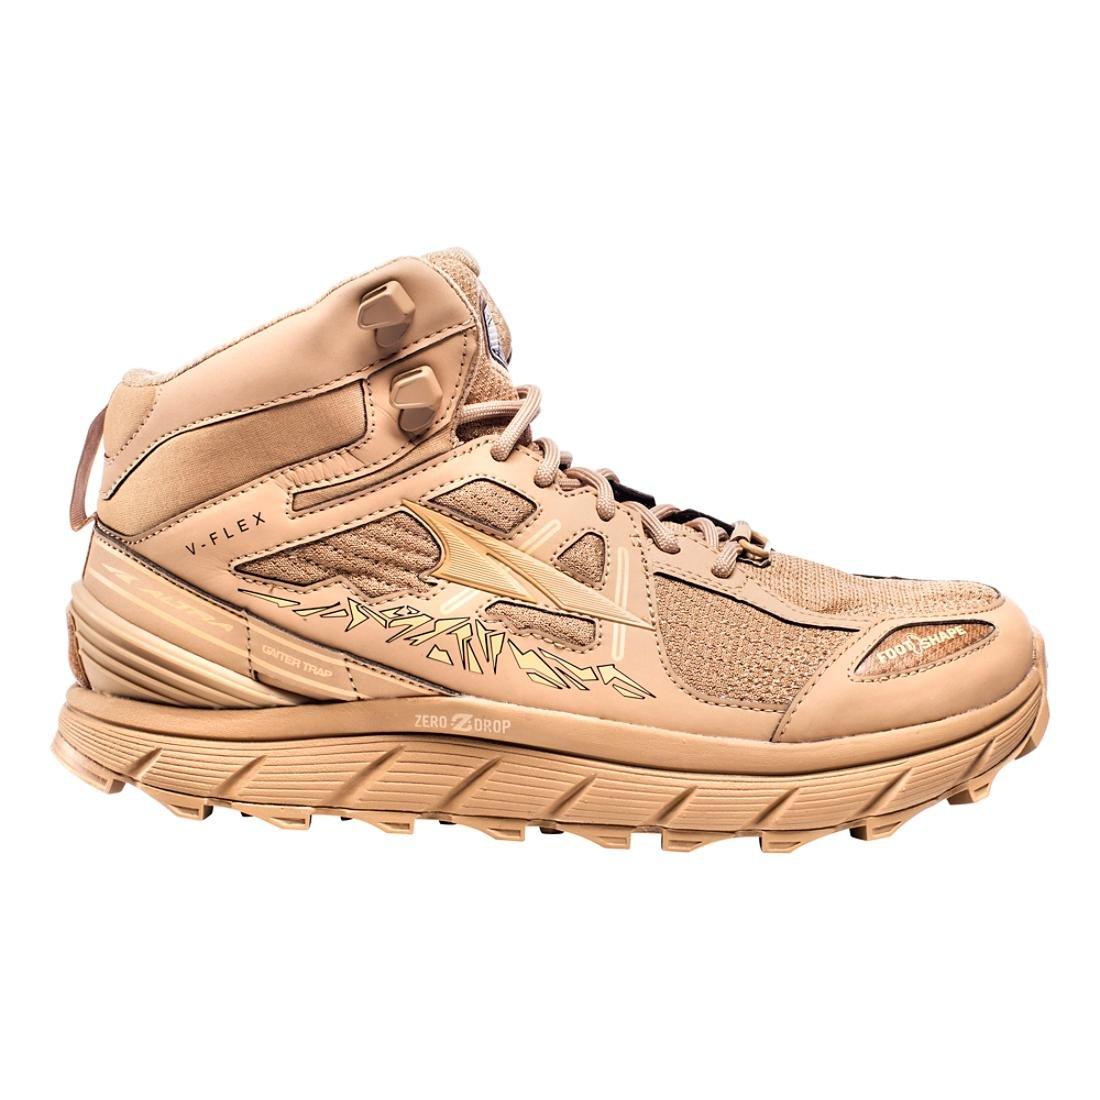 Altra Women's Lone Peak 3.5 Mid Mesh Running Shoe B01MT1K1W4 6 B(M) US|Sand